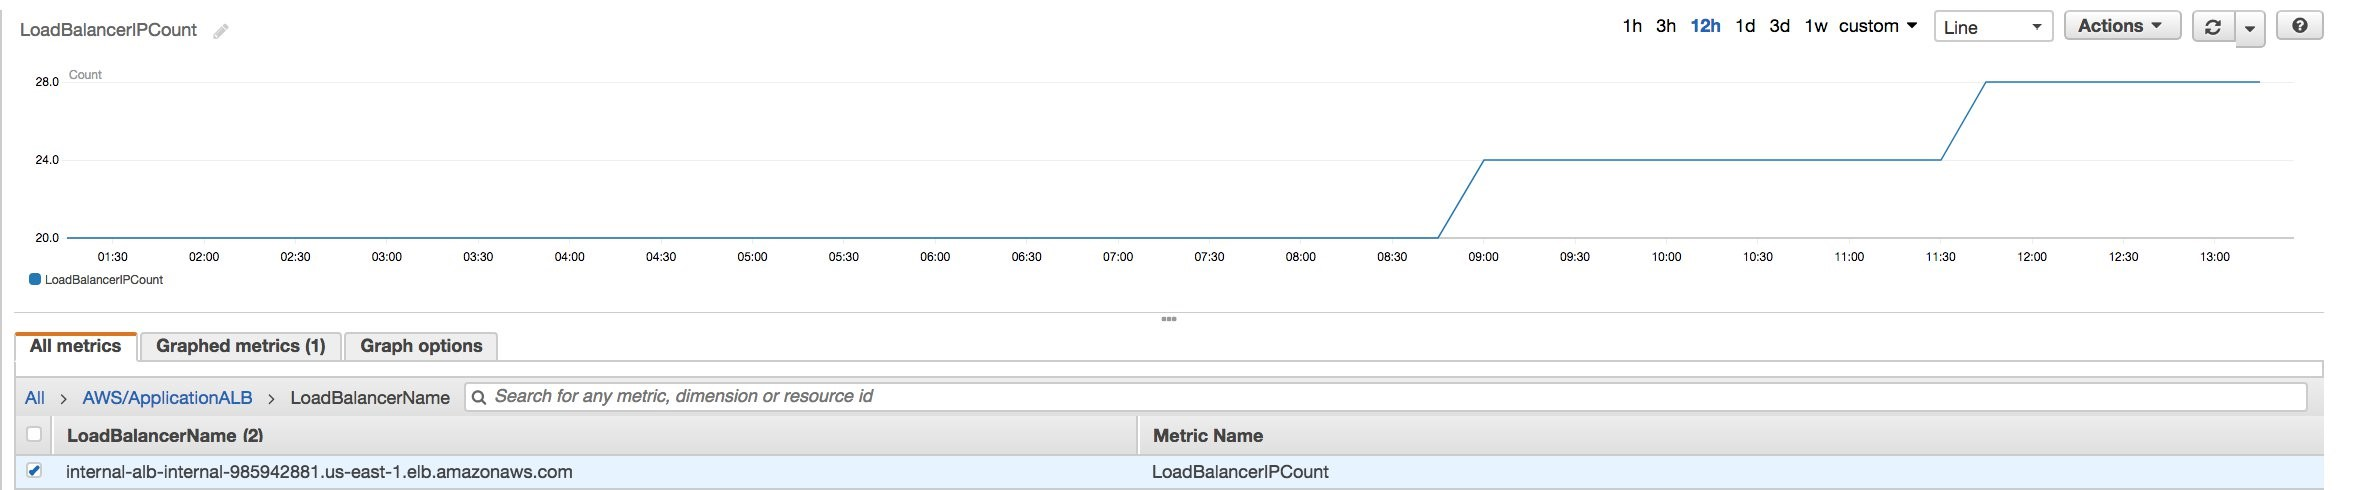 Using static IP addresses for Application Load Balancers